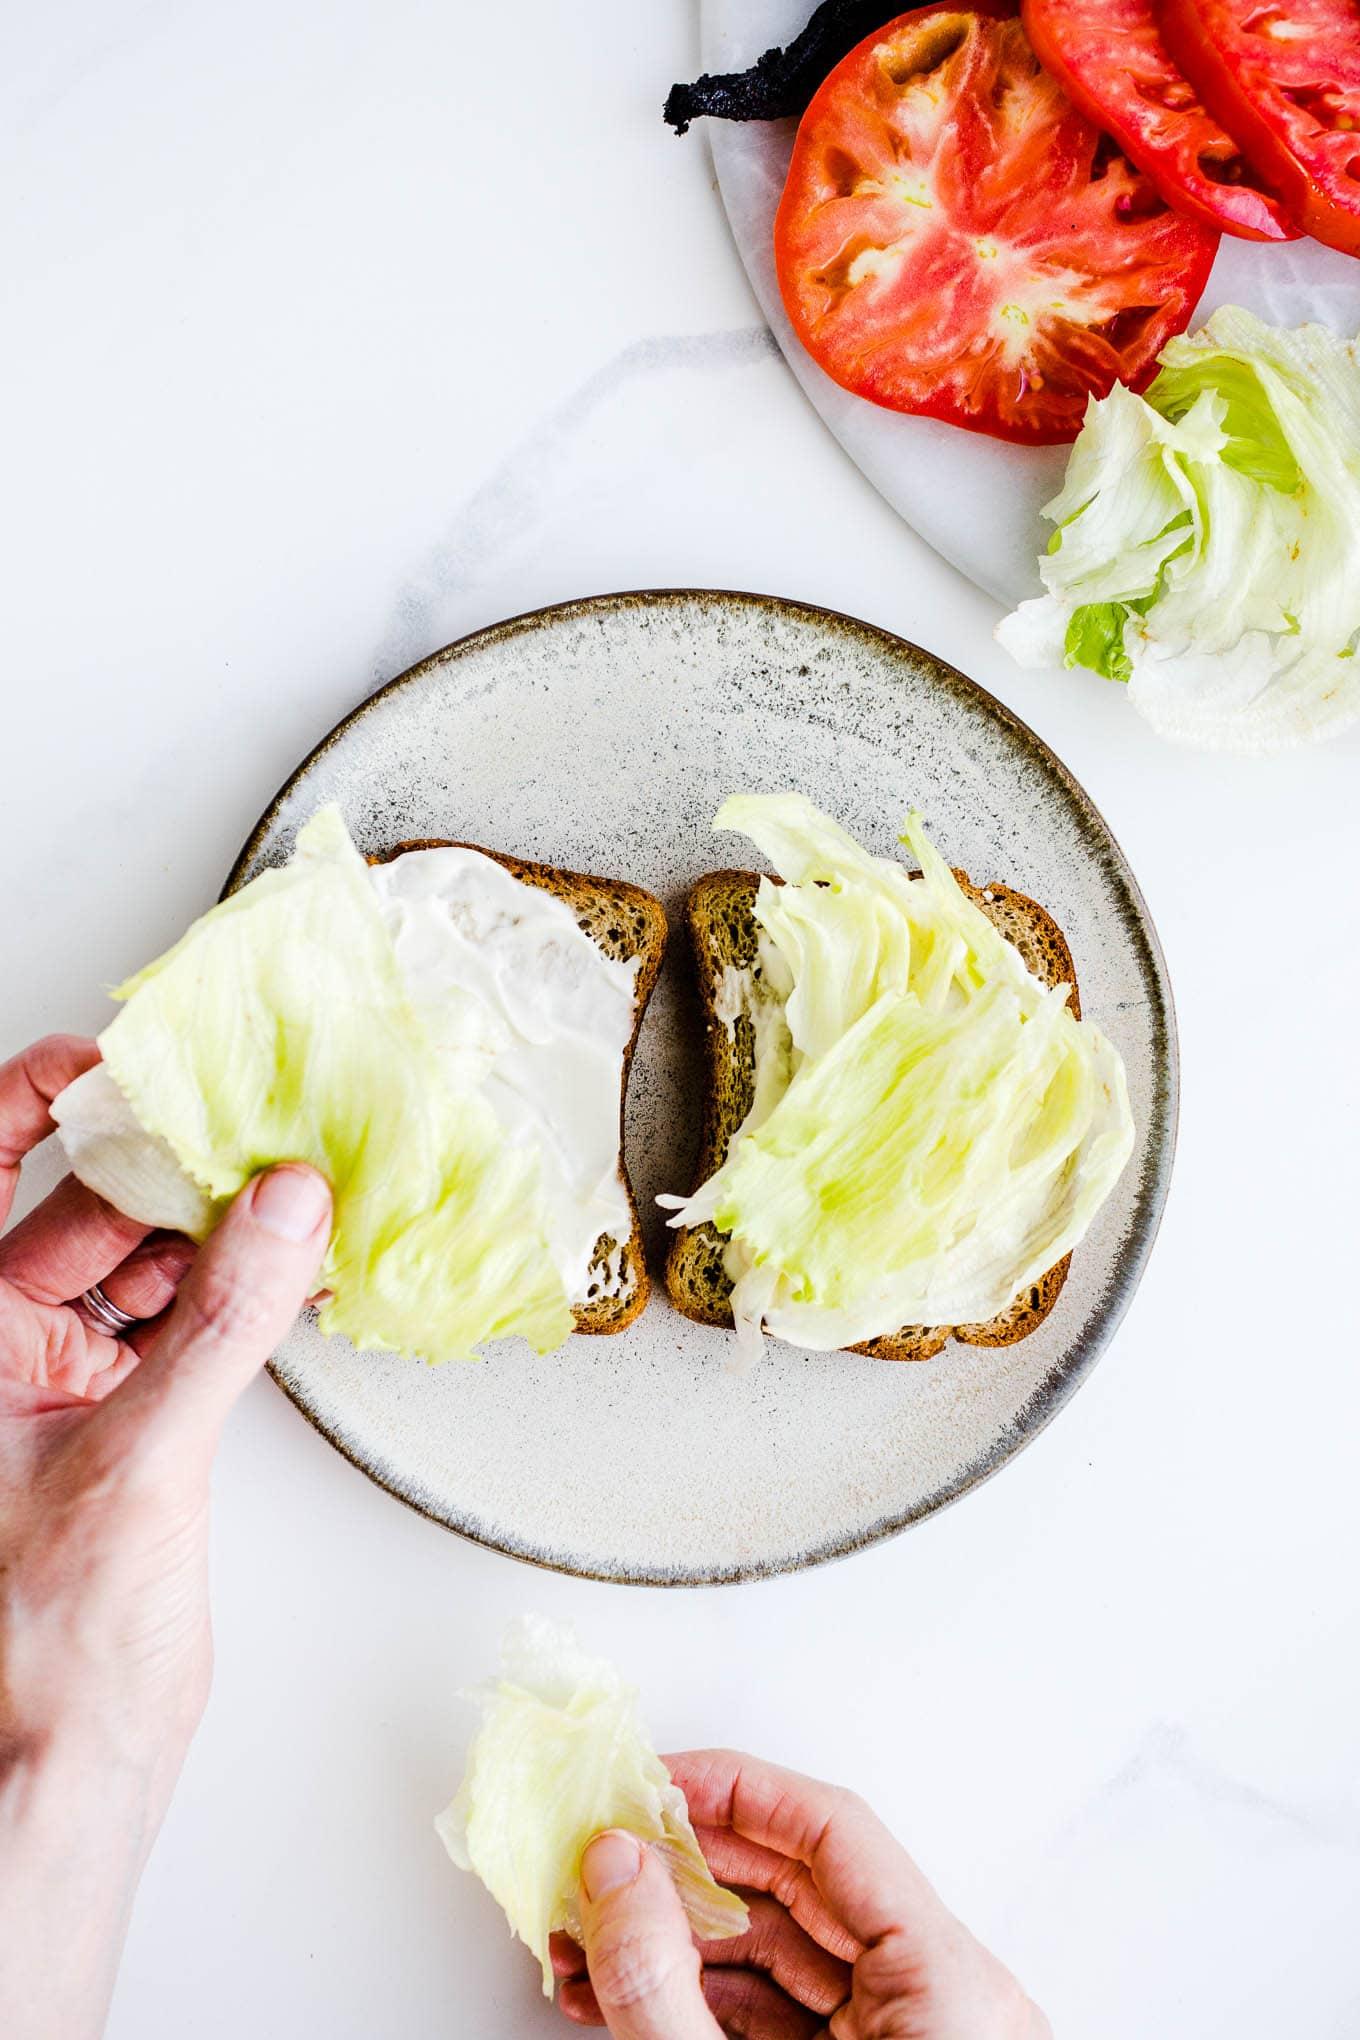 iceberg lettuces on slices of bread